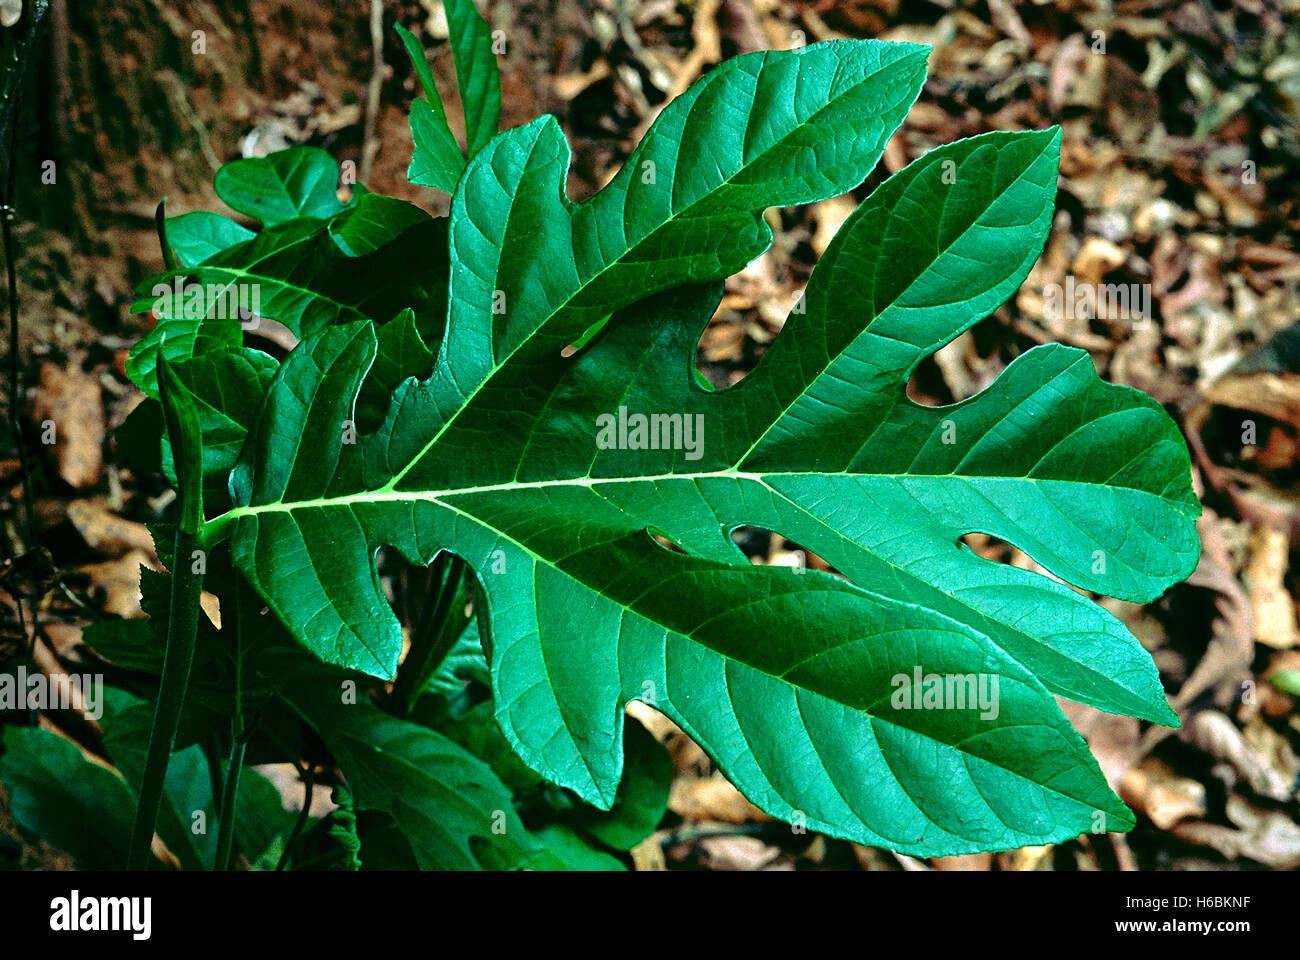 Leaf. Artocarpus sp. Family: Moraceae. A kind of wild Jack-fruit tree. The leaves of the saplings are large. The - Stock Image